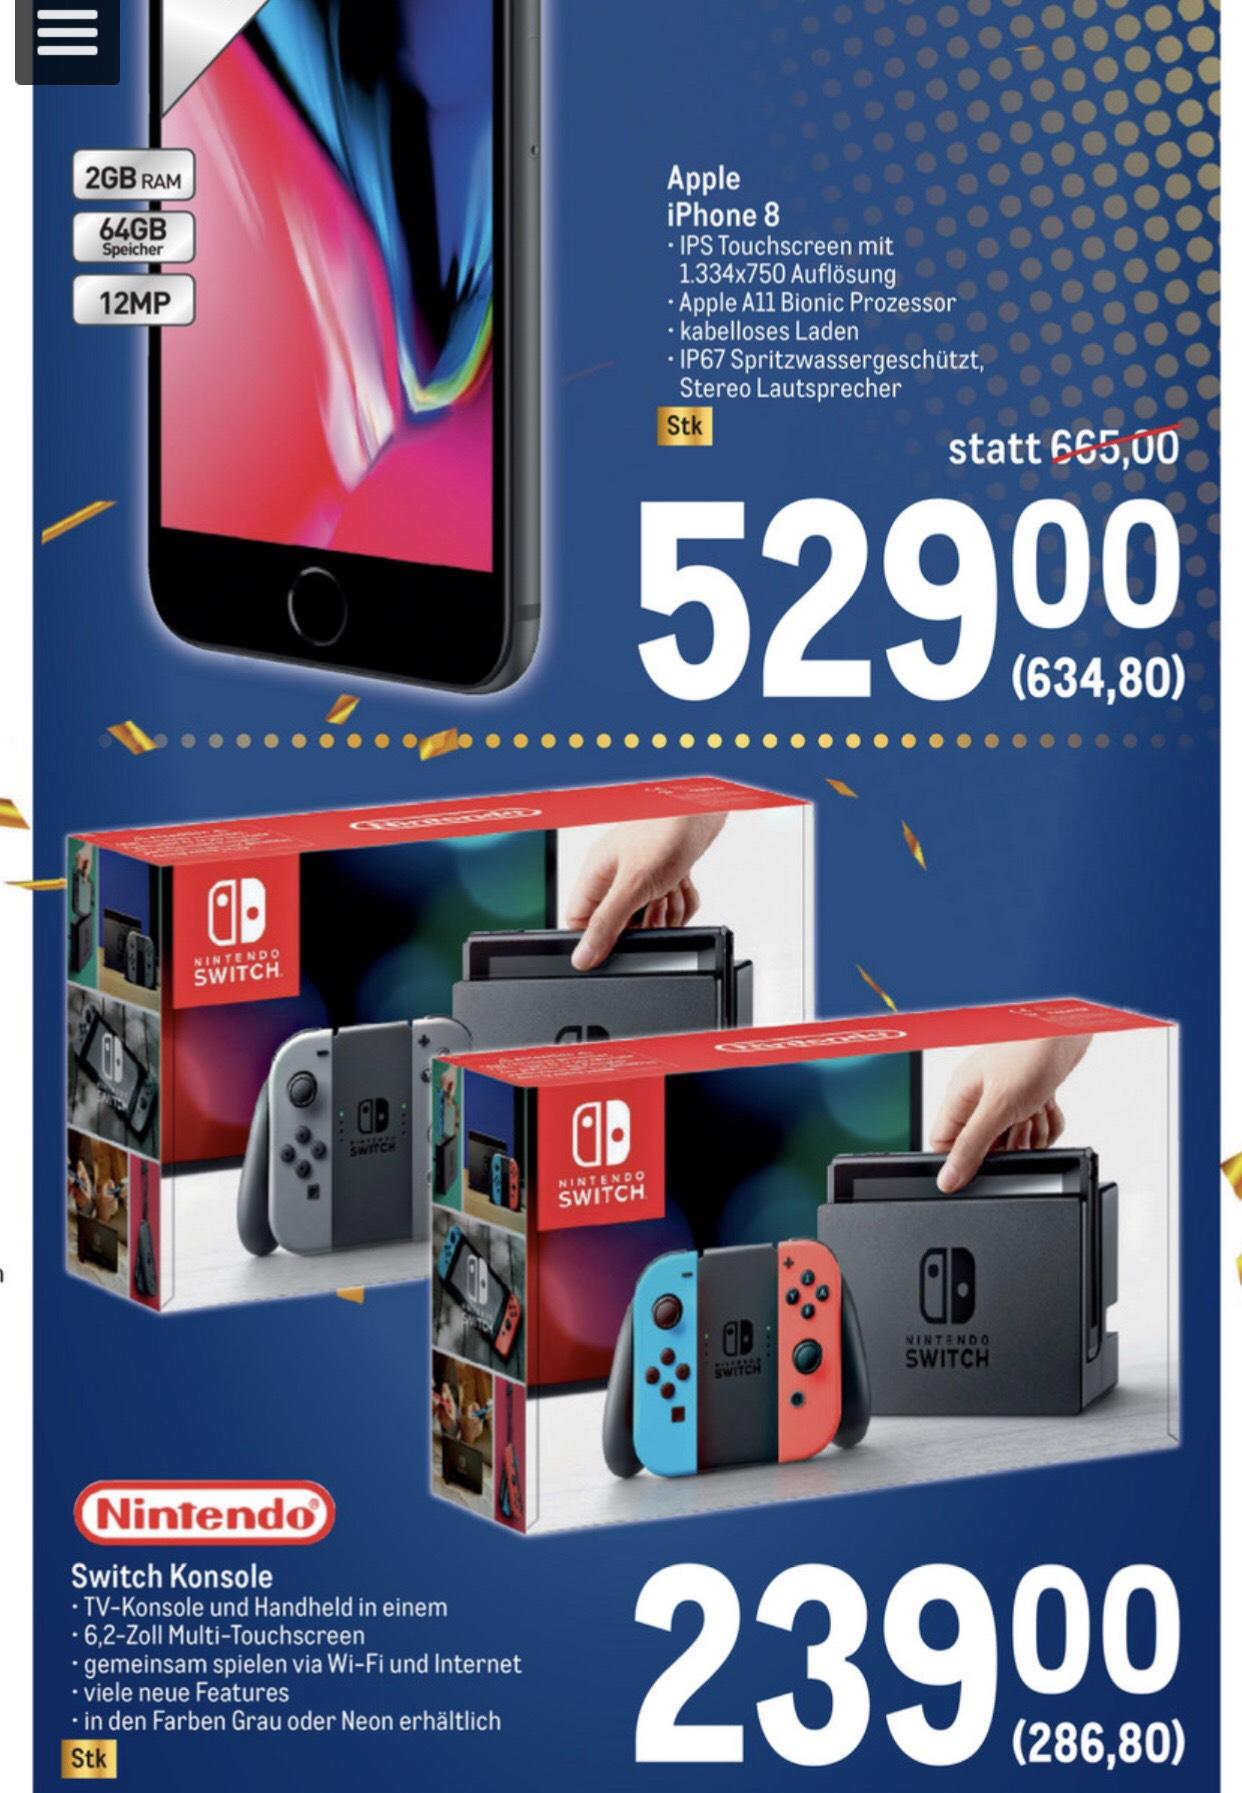 [Metro Jubiläum] Nintendo Switch in Grau/Blau-Rot